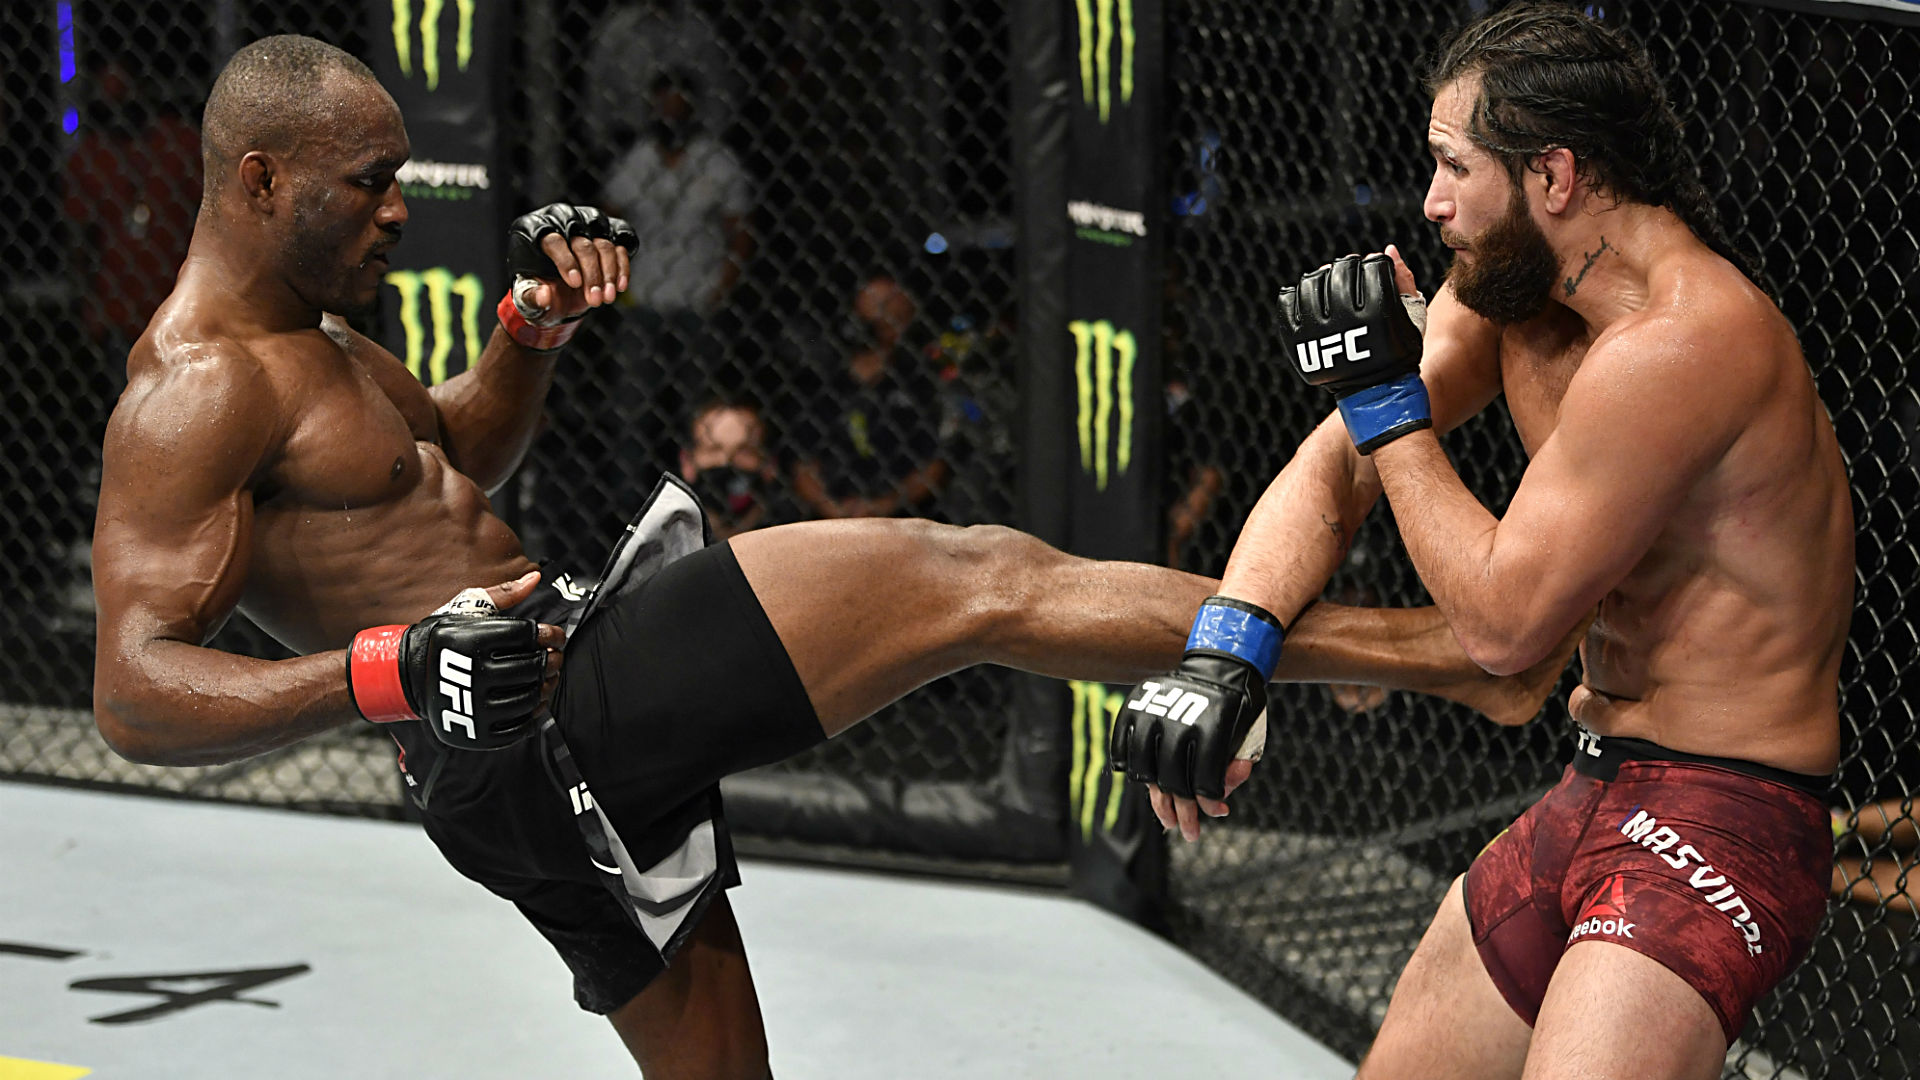 Kamaru Usman Vs.  Jorge Masvidal 2 date, start time, odds, PPV schedule and UFC 261 card